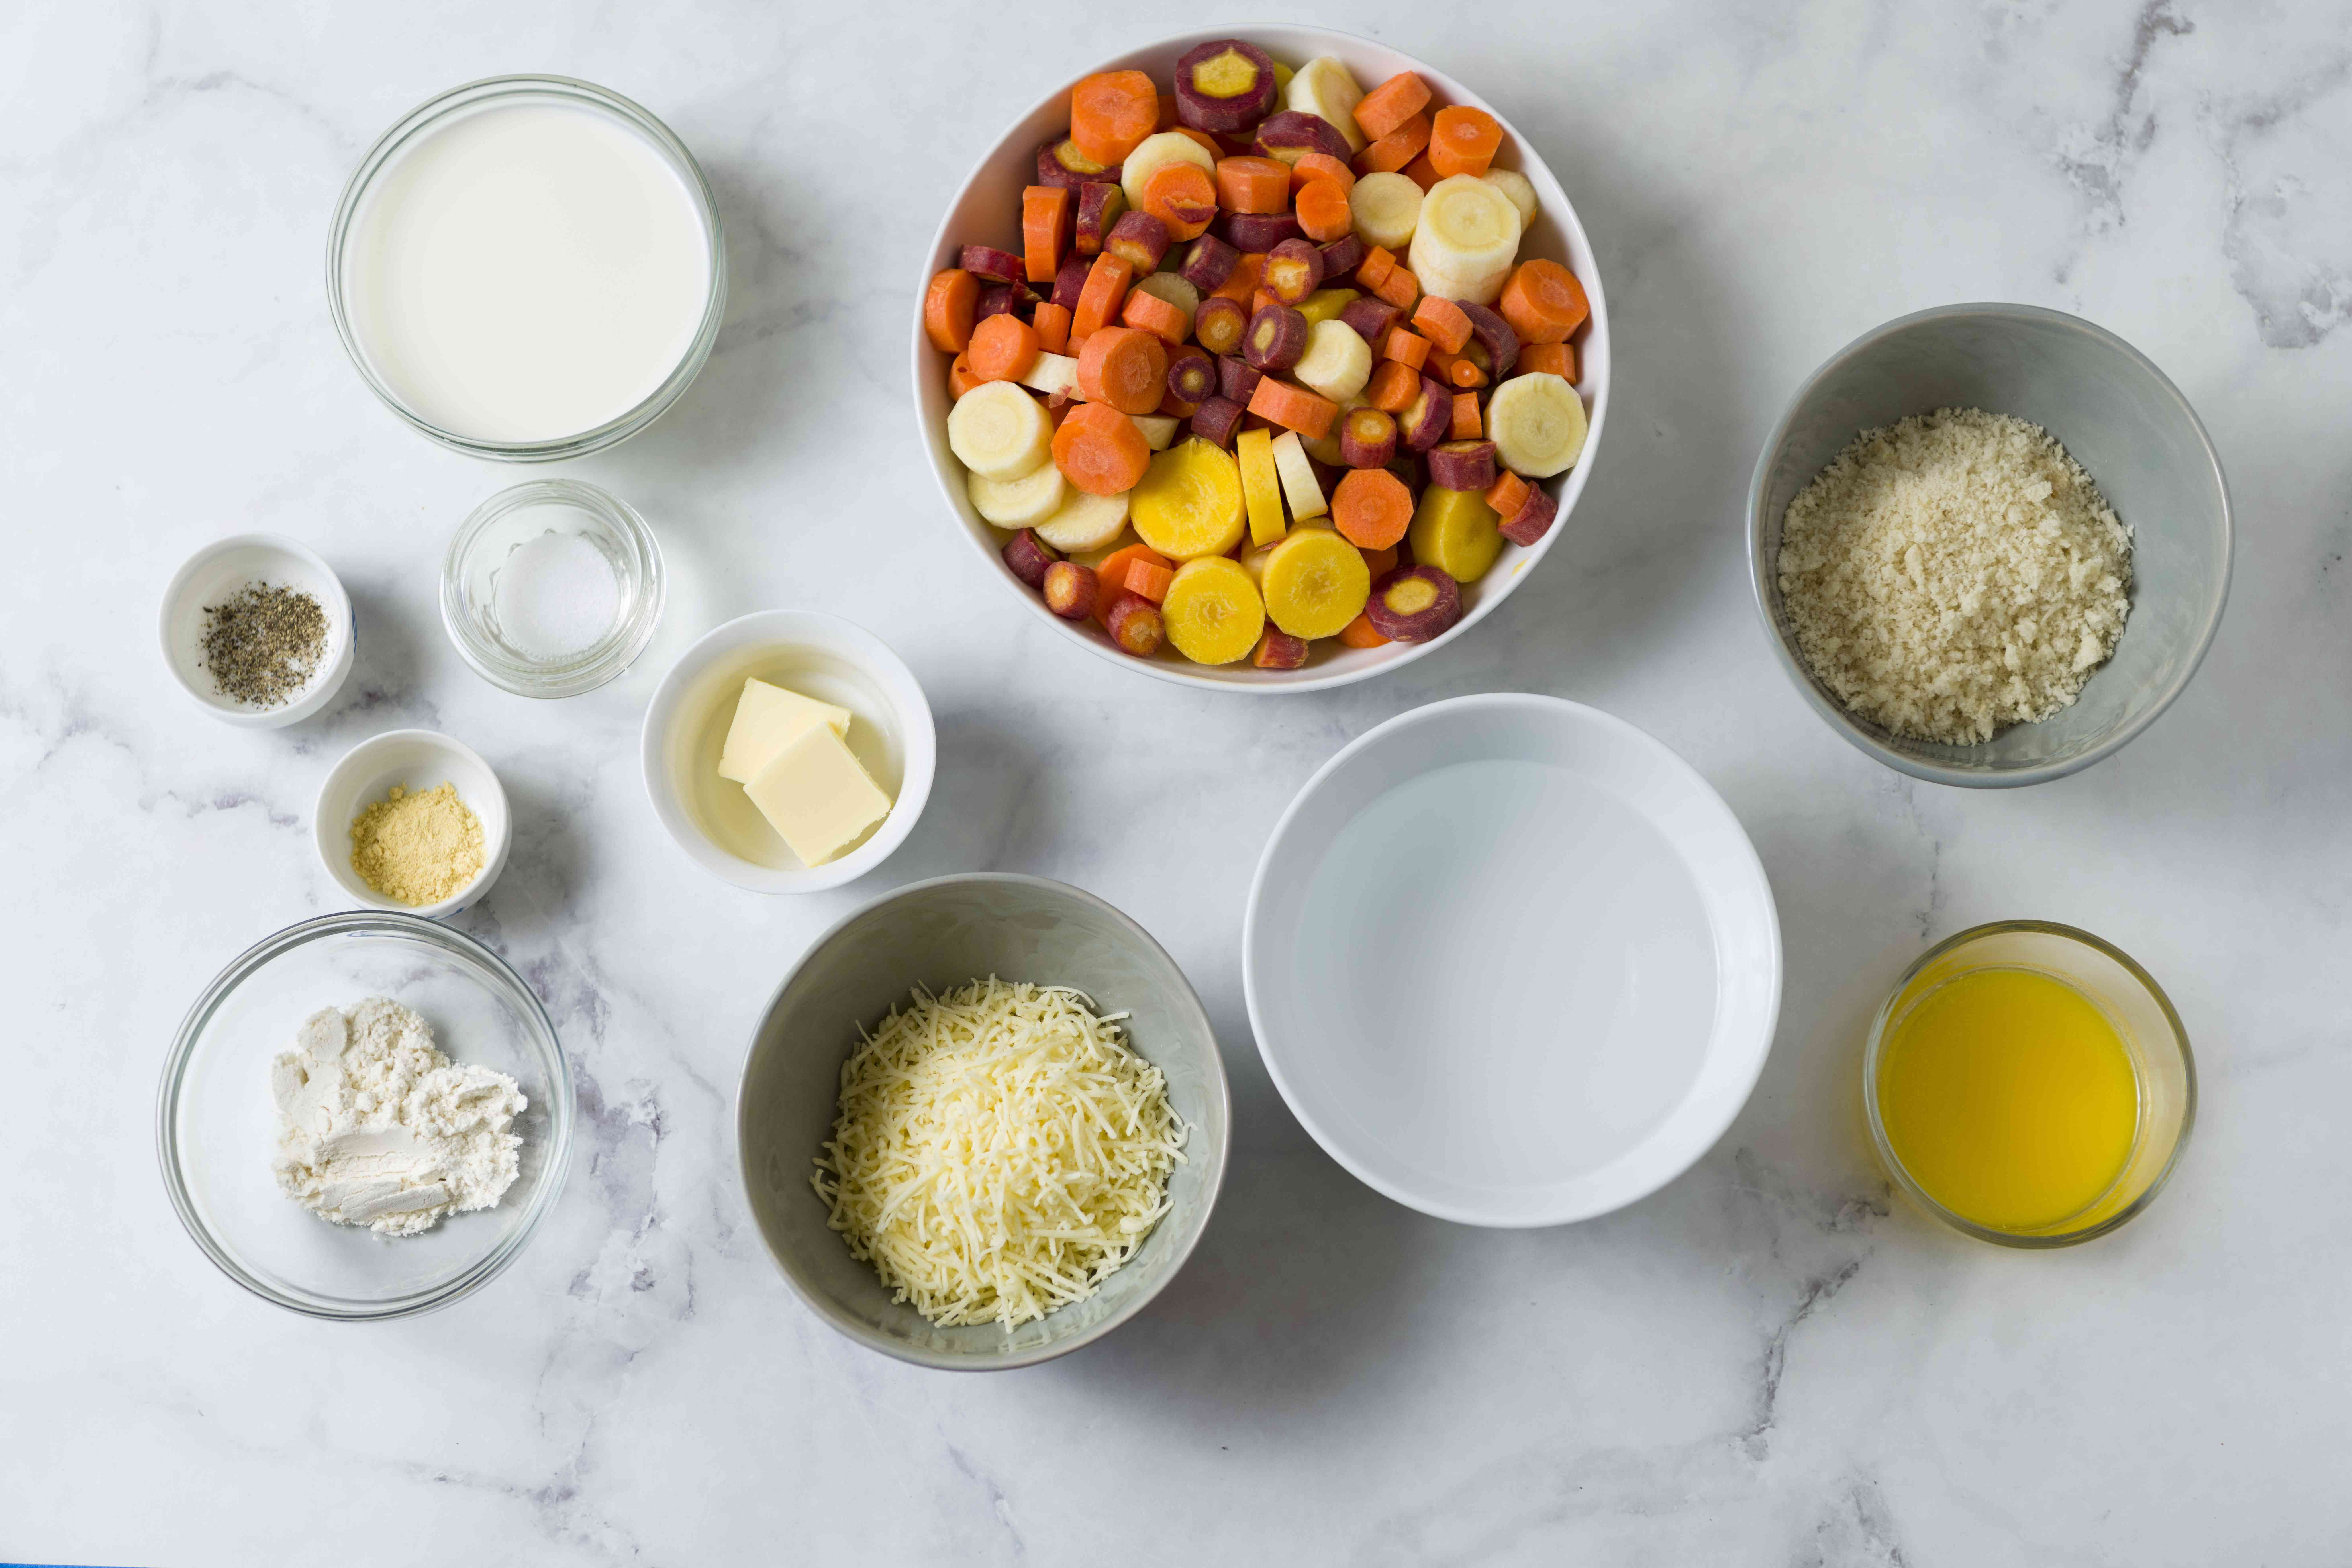 carrot casserole ingredients